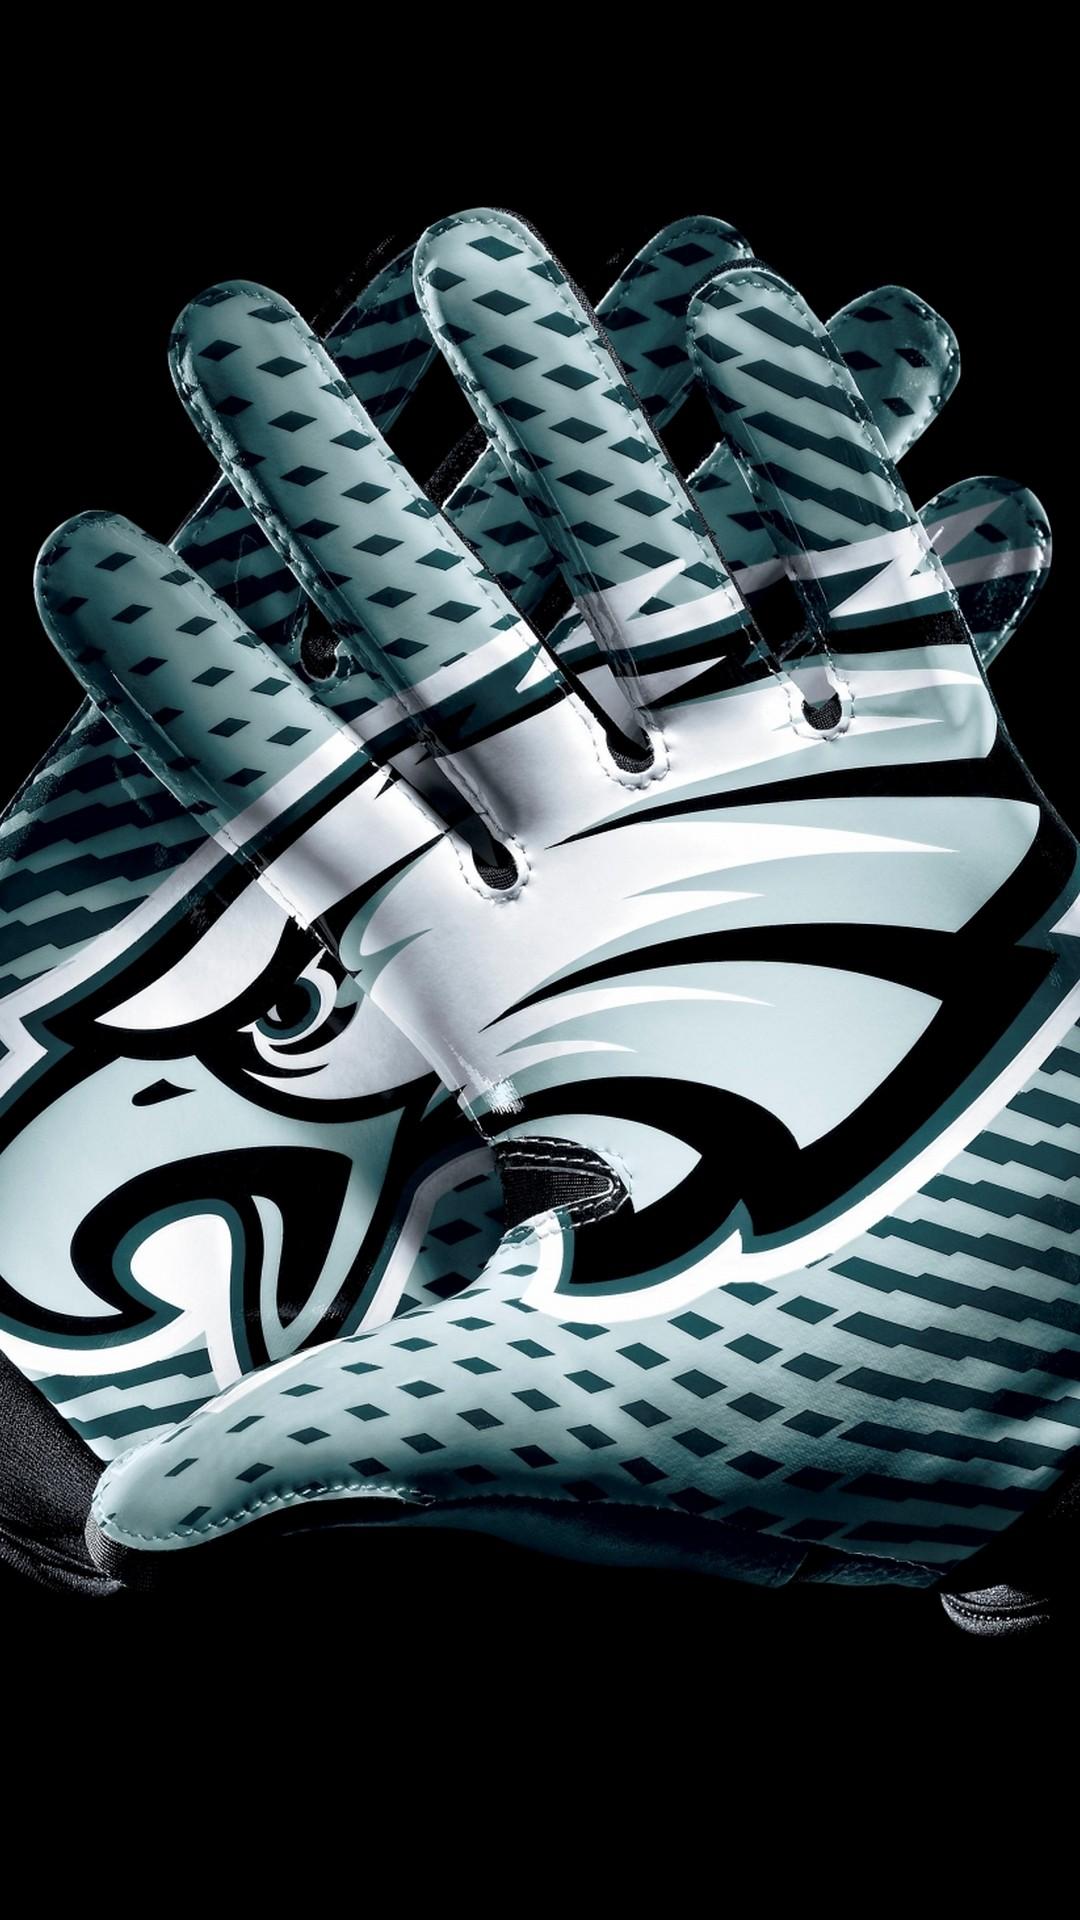 Wallpaper Philadelphia Eagles Iphone 2019 Nfl Football